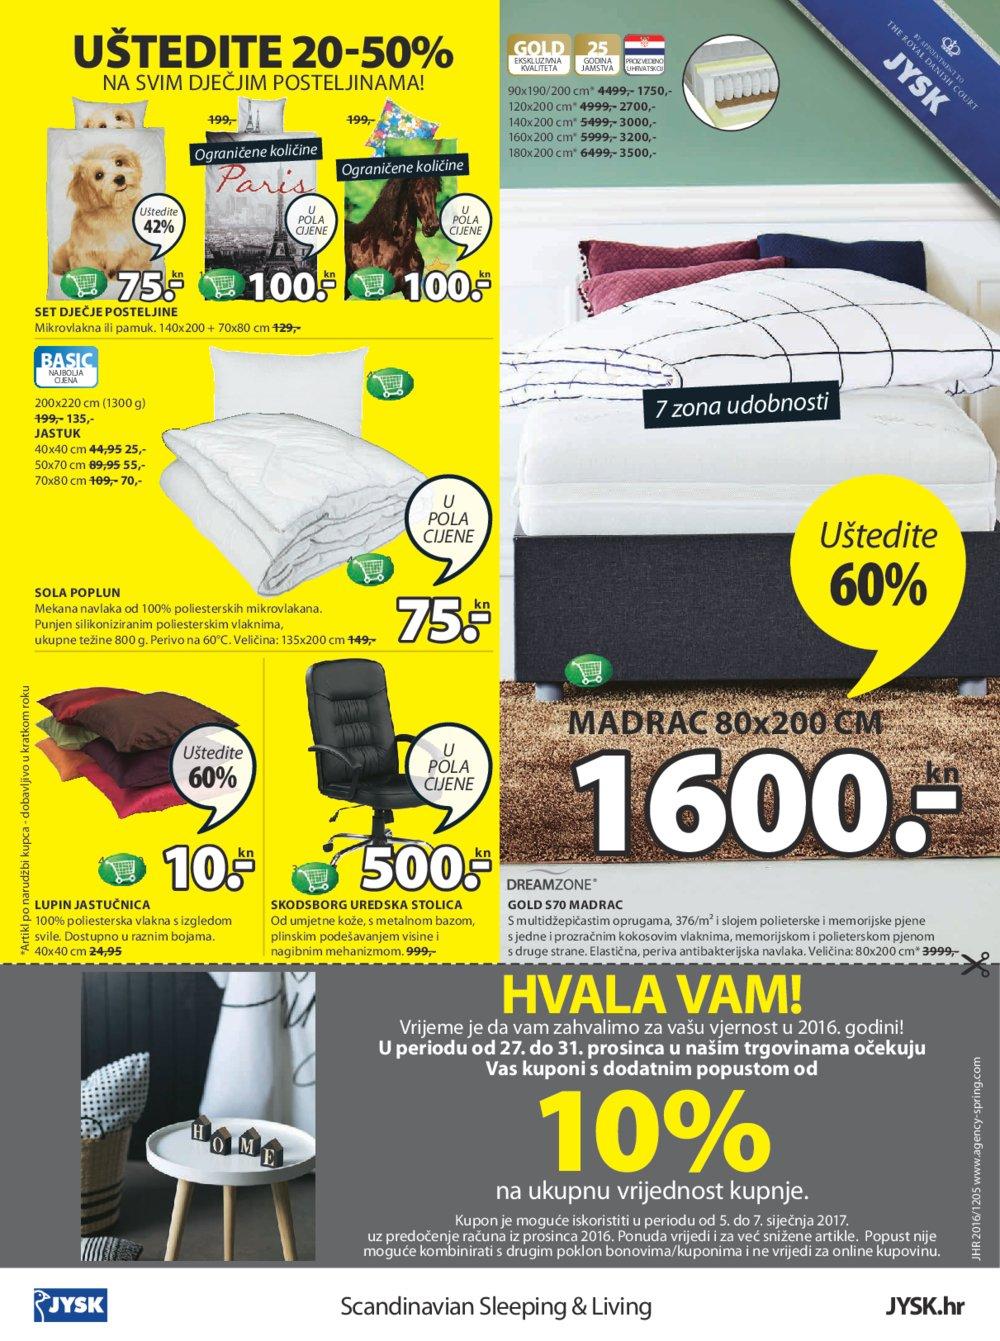 Jysk katalog do 11.01.2016.